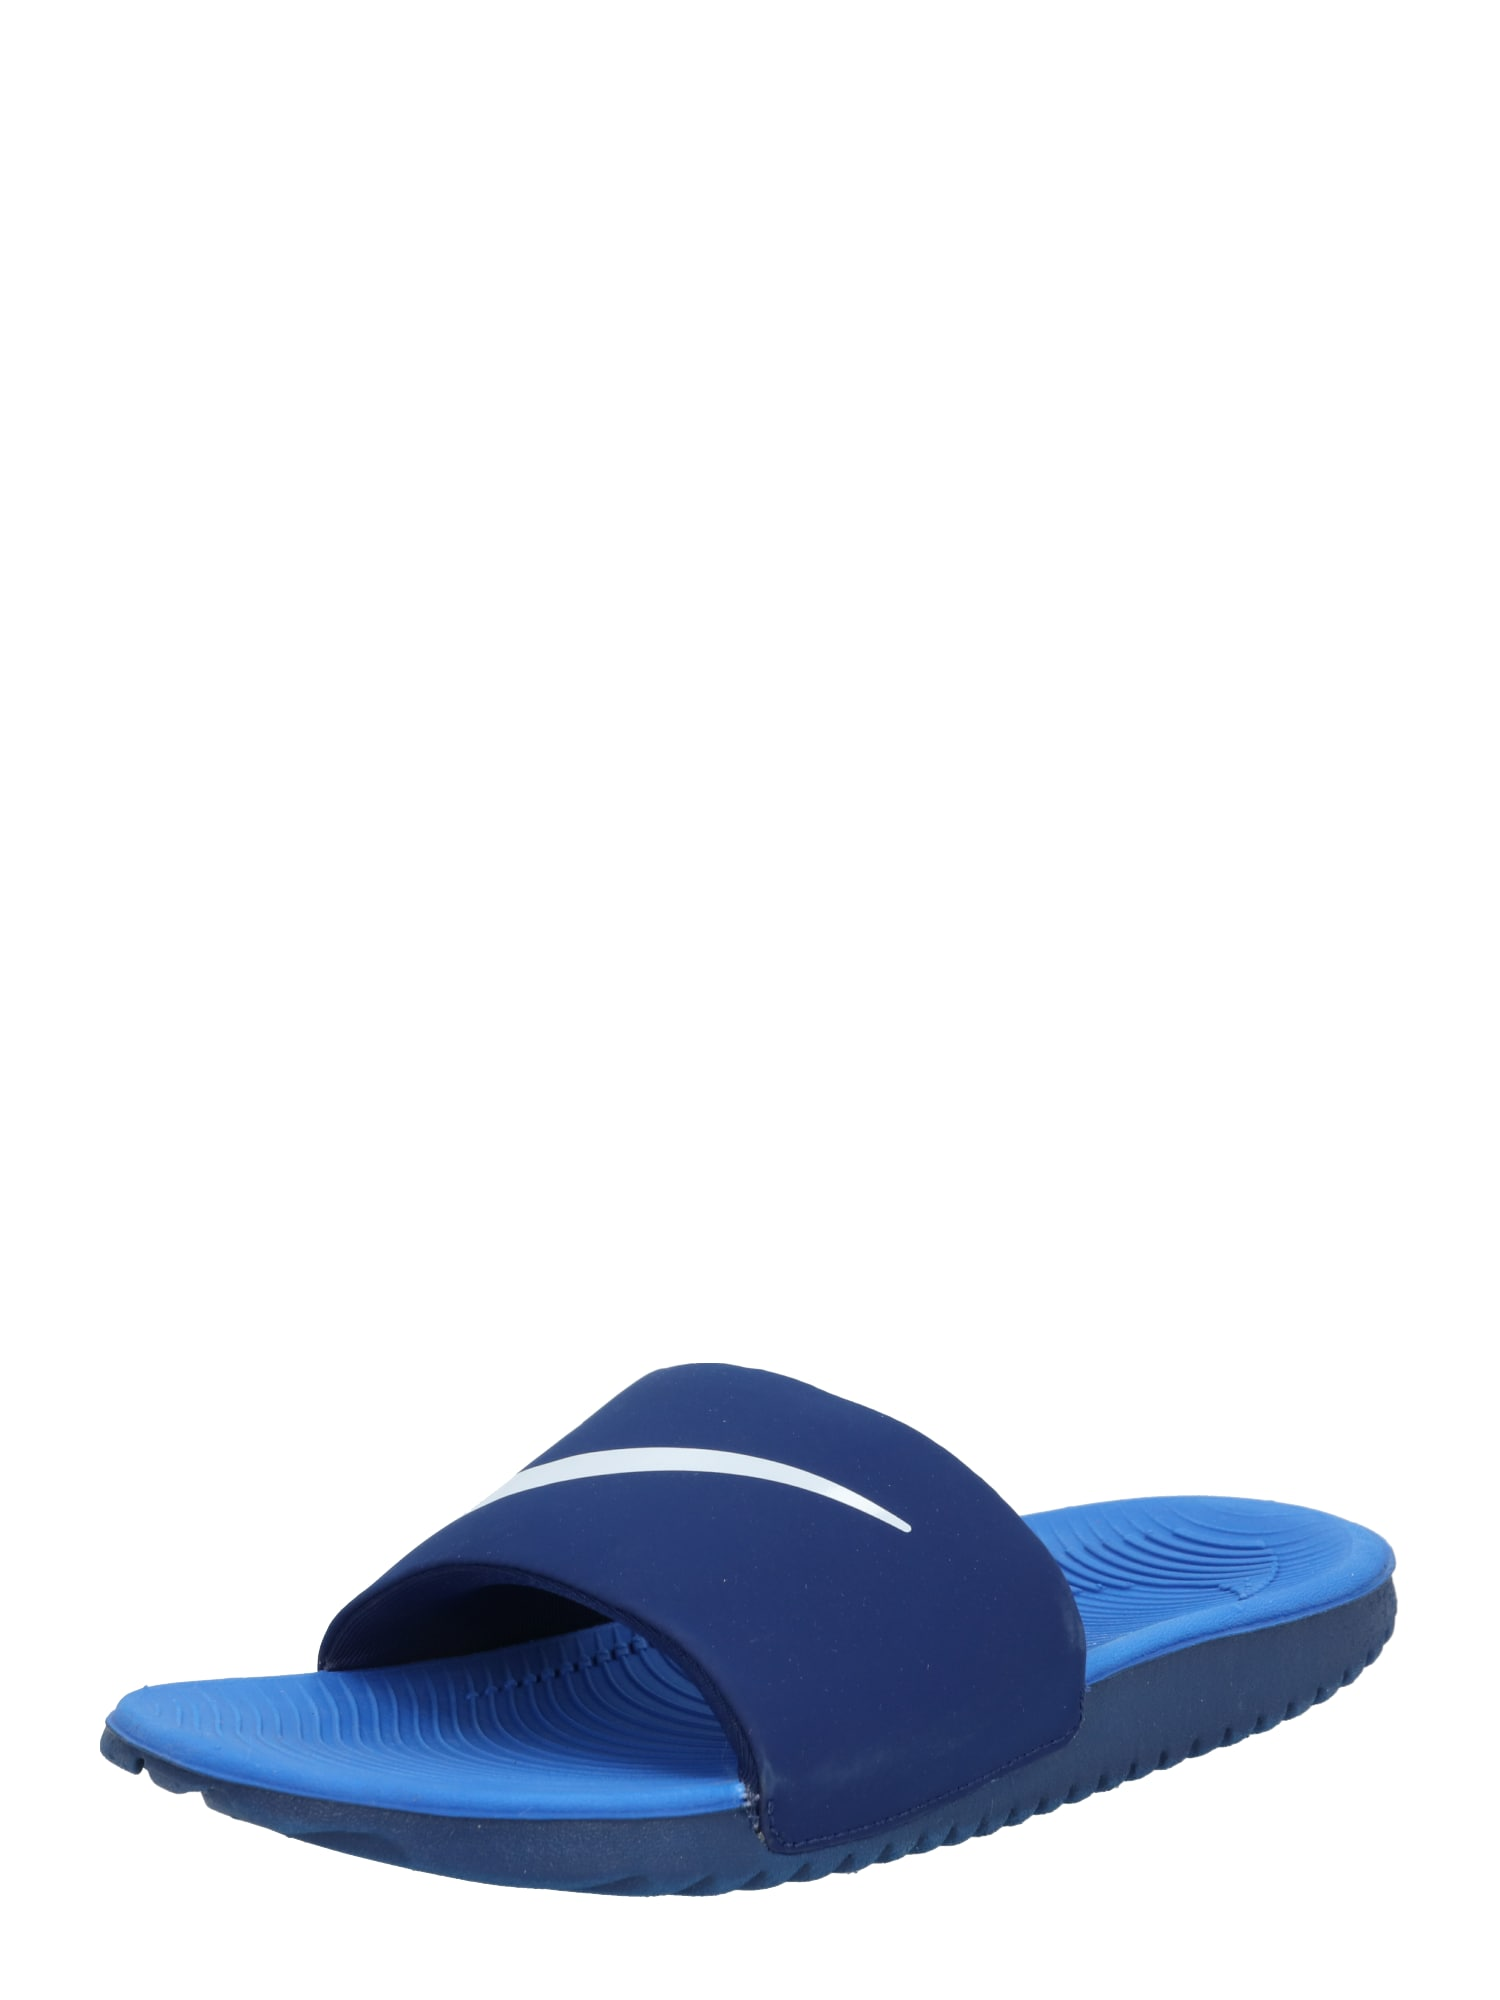 NIKE Sandalai / maudymosi batai 'KAWA' tamsiai mėlyna / balta